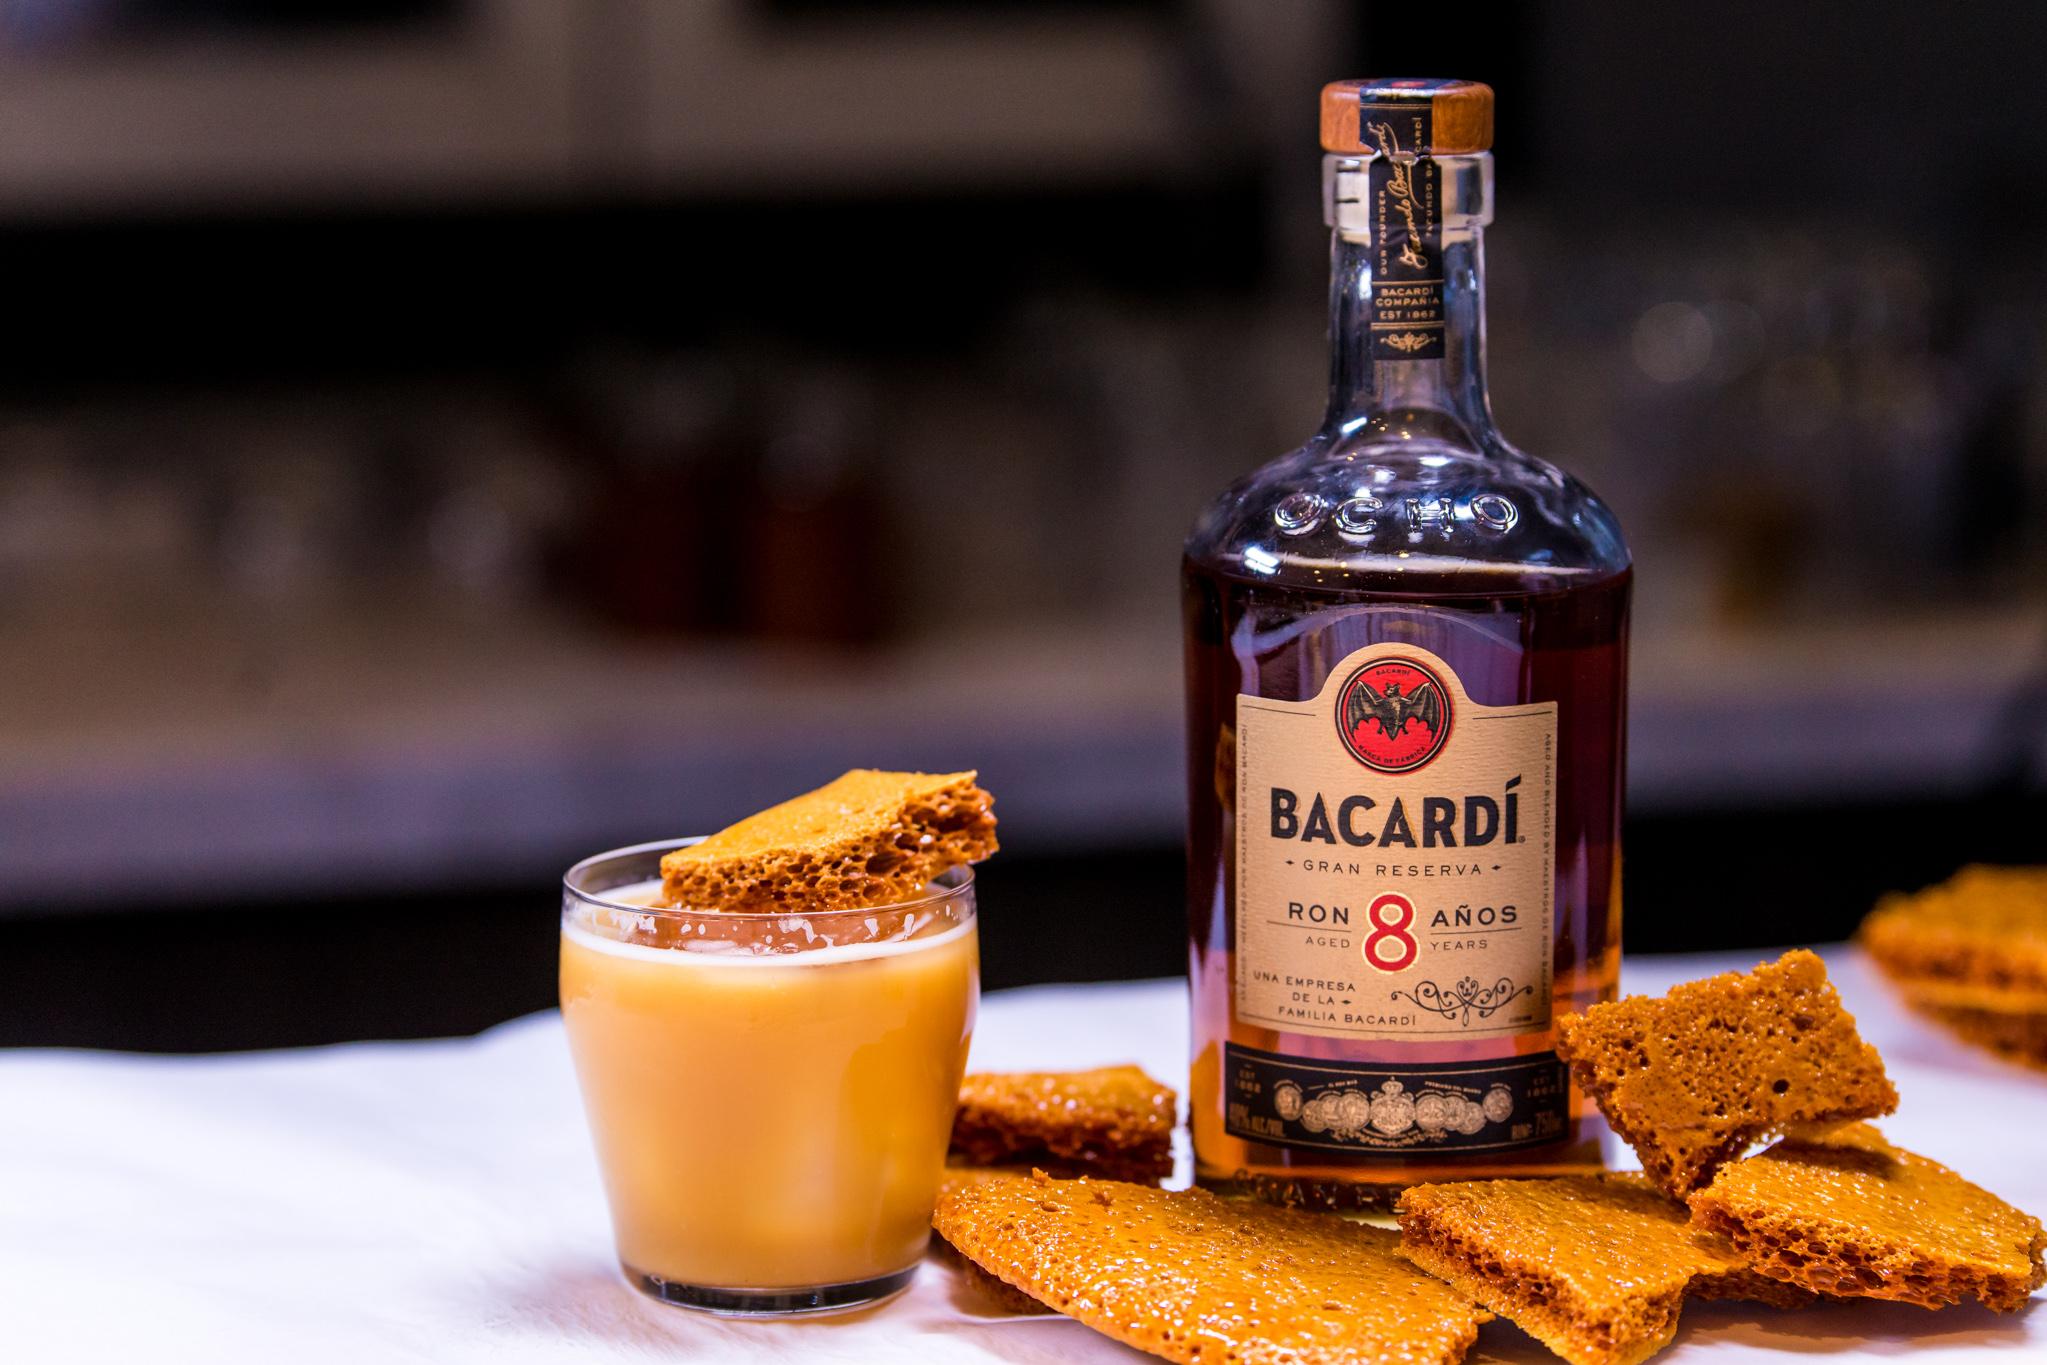 The Vida Rica /Bacardi 8